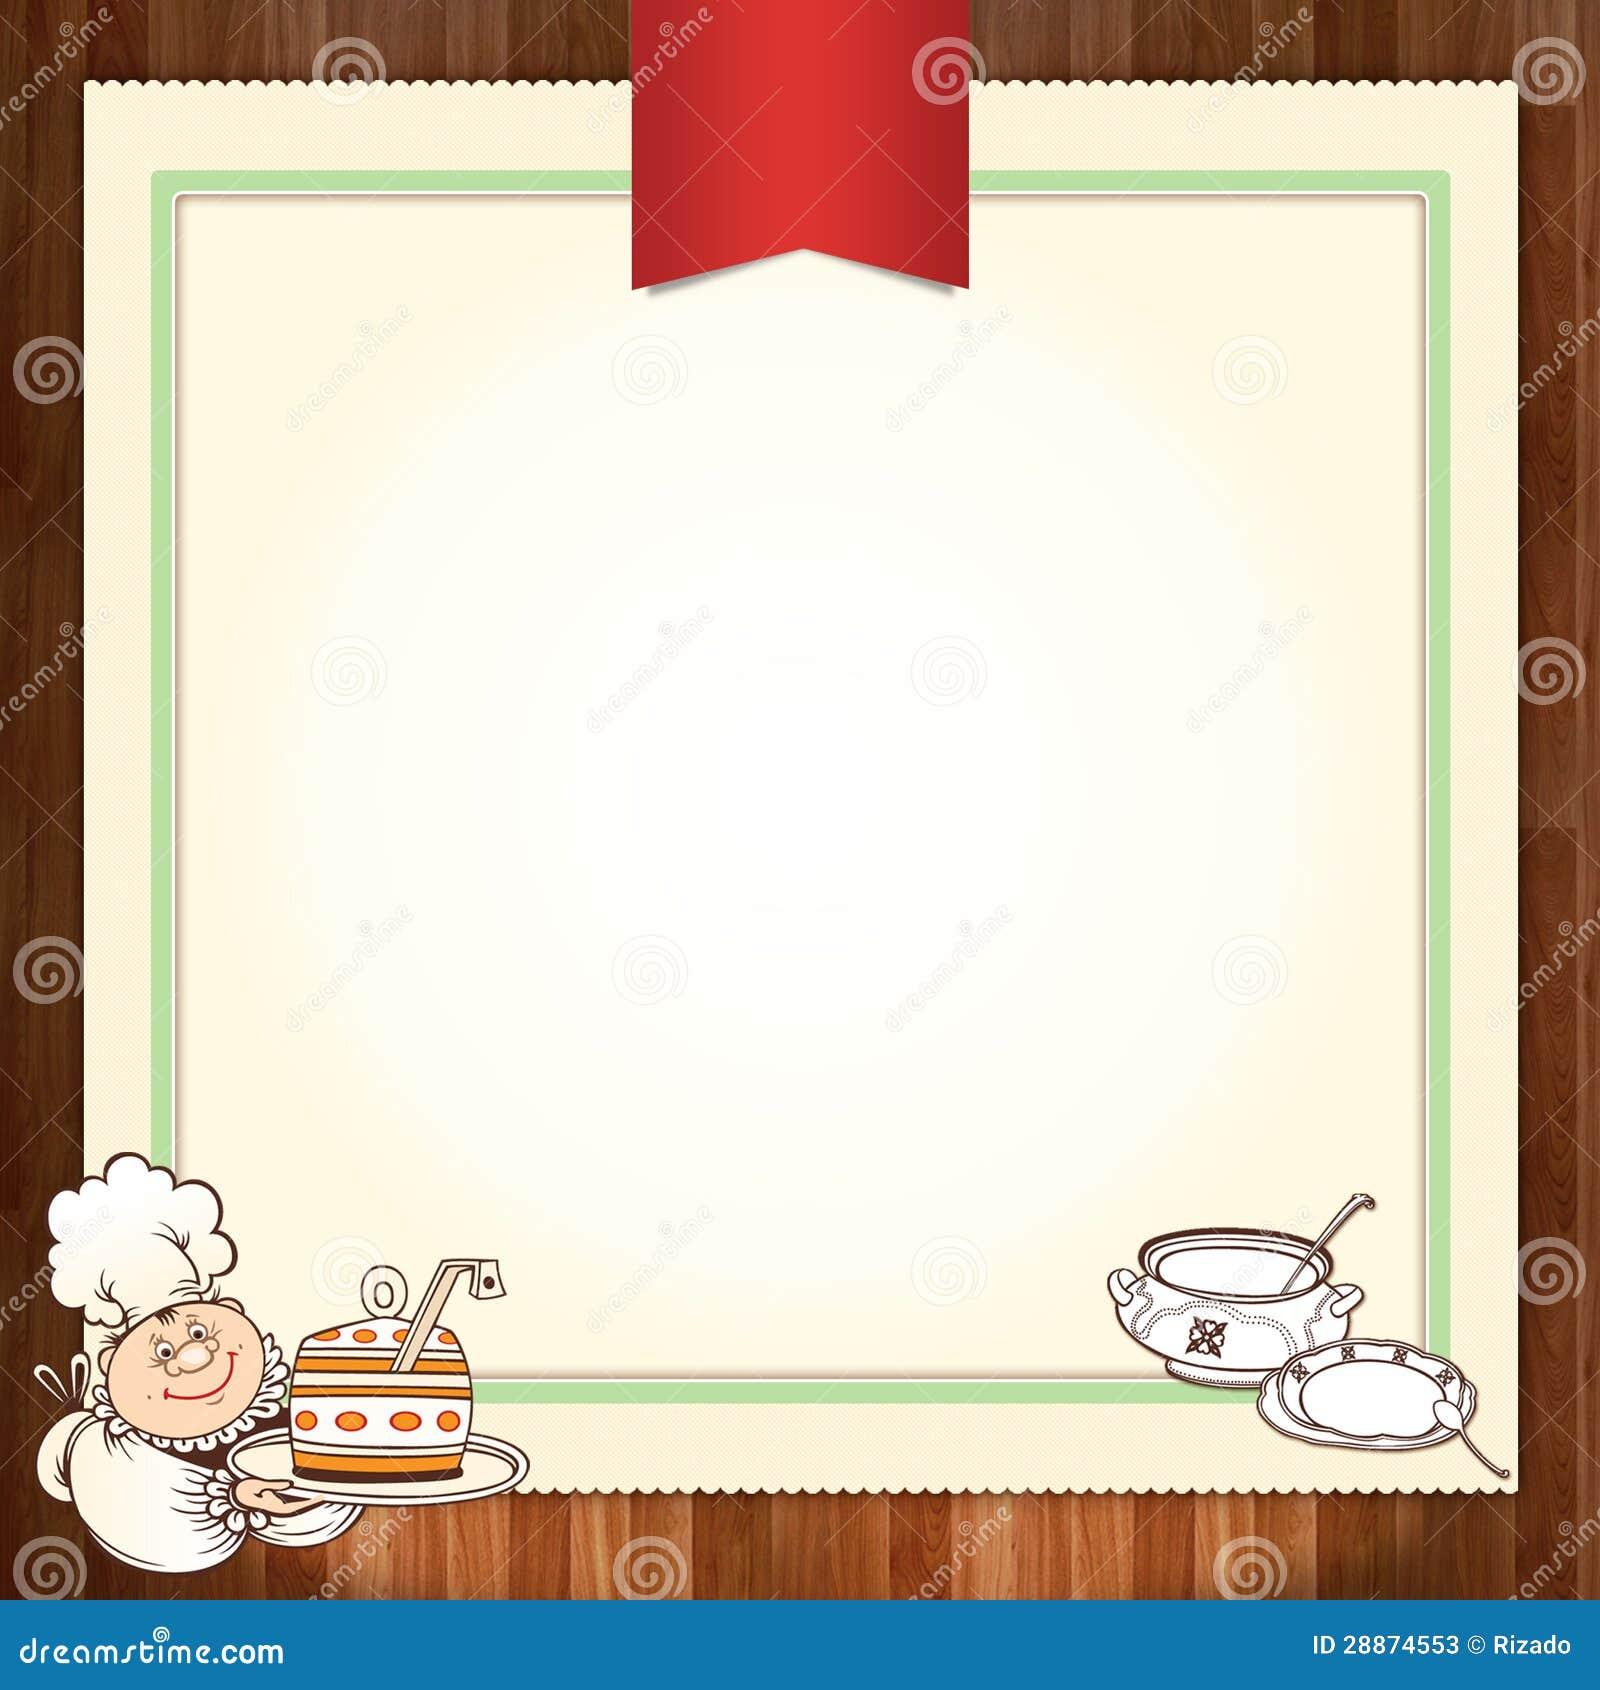 culinary menu template stock illustration illustration of